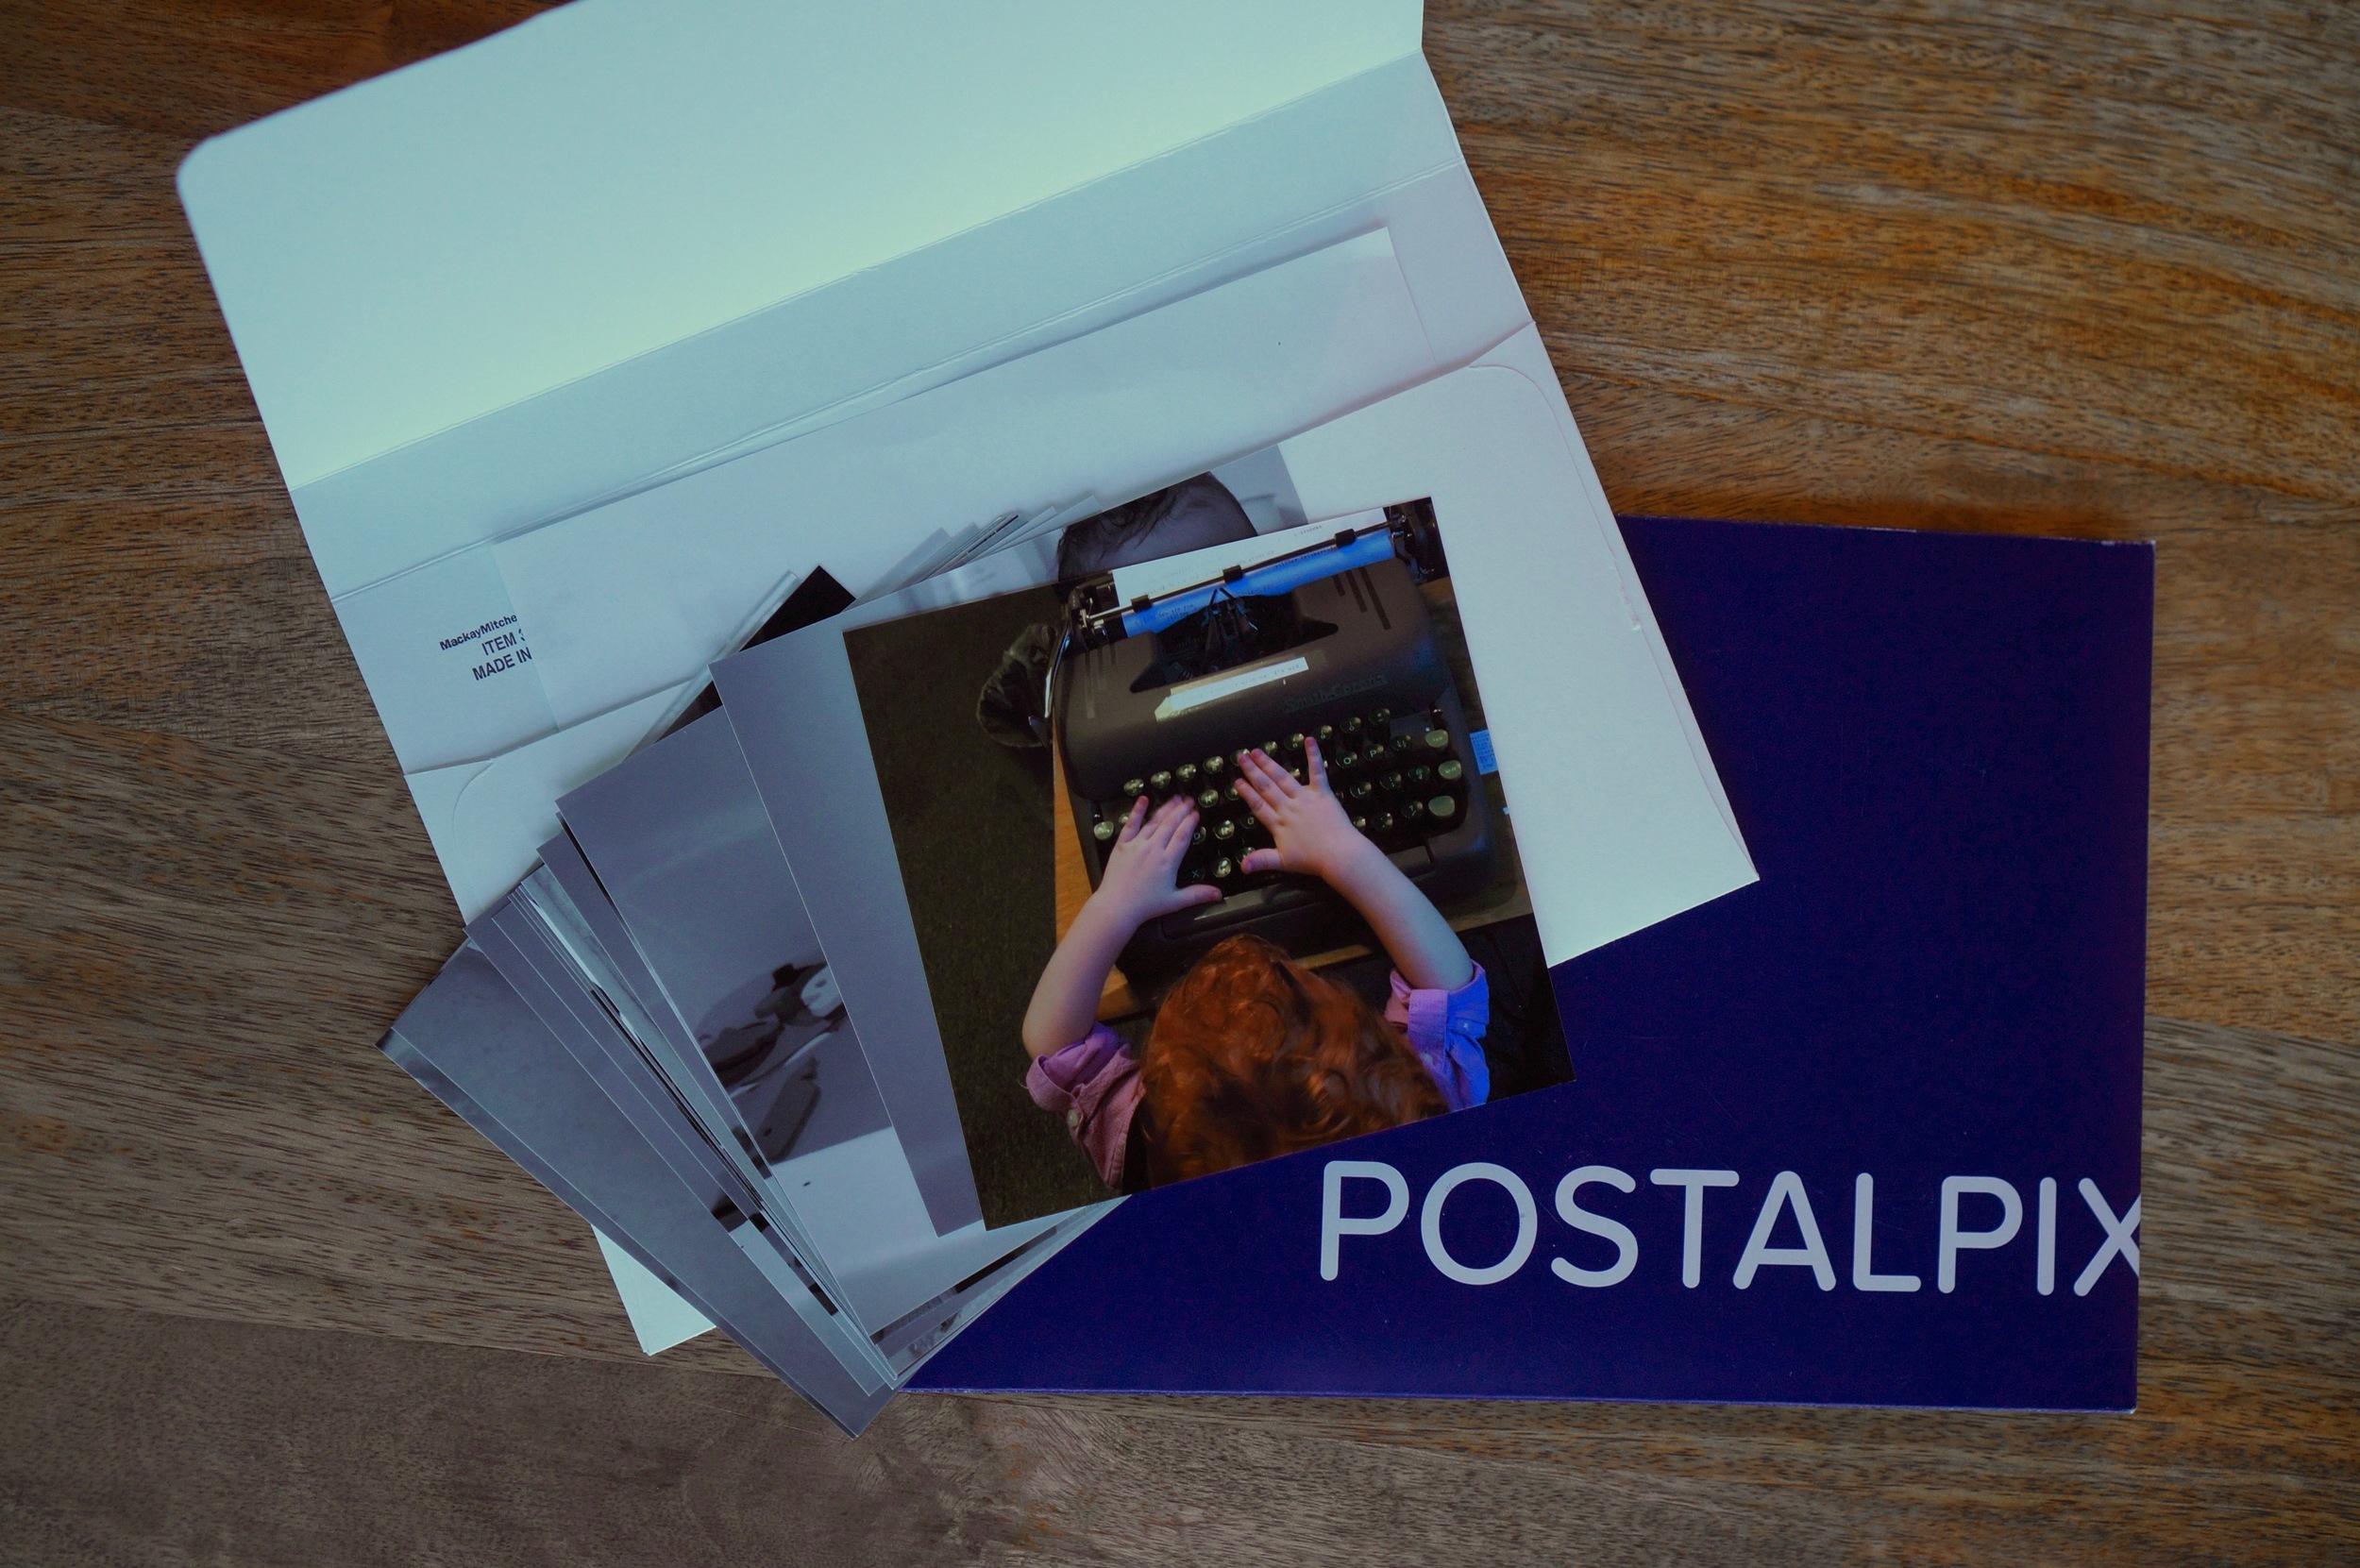 4x4 prints from PostalPix.